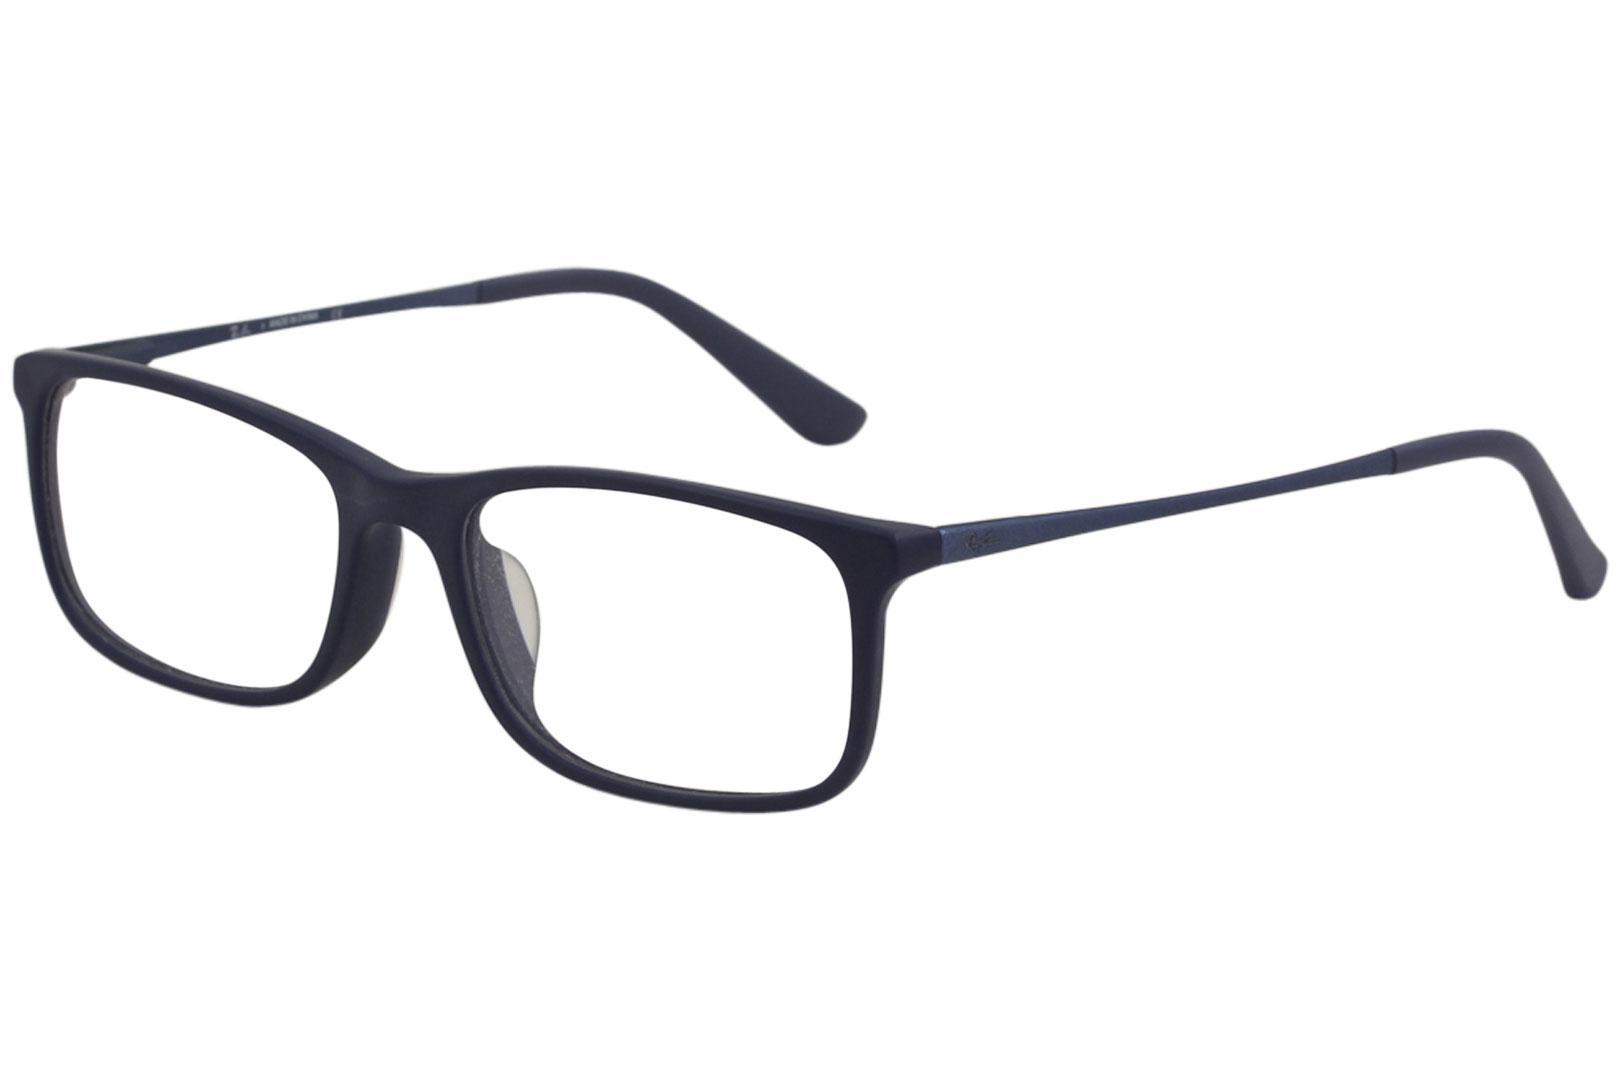 3dd36a2d9c Ray Ban Eyeglasses RX5342D RX 5342 D RayBan 5671 Matte Blue Optical ...